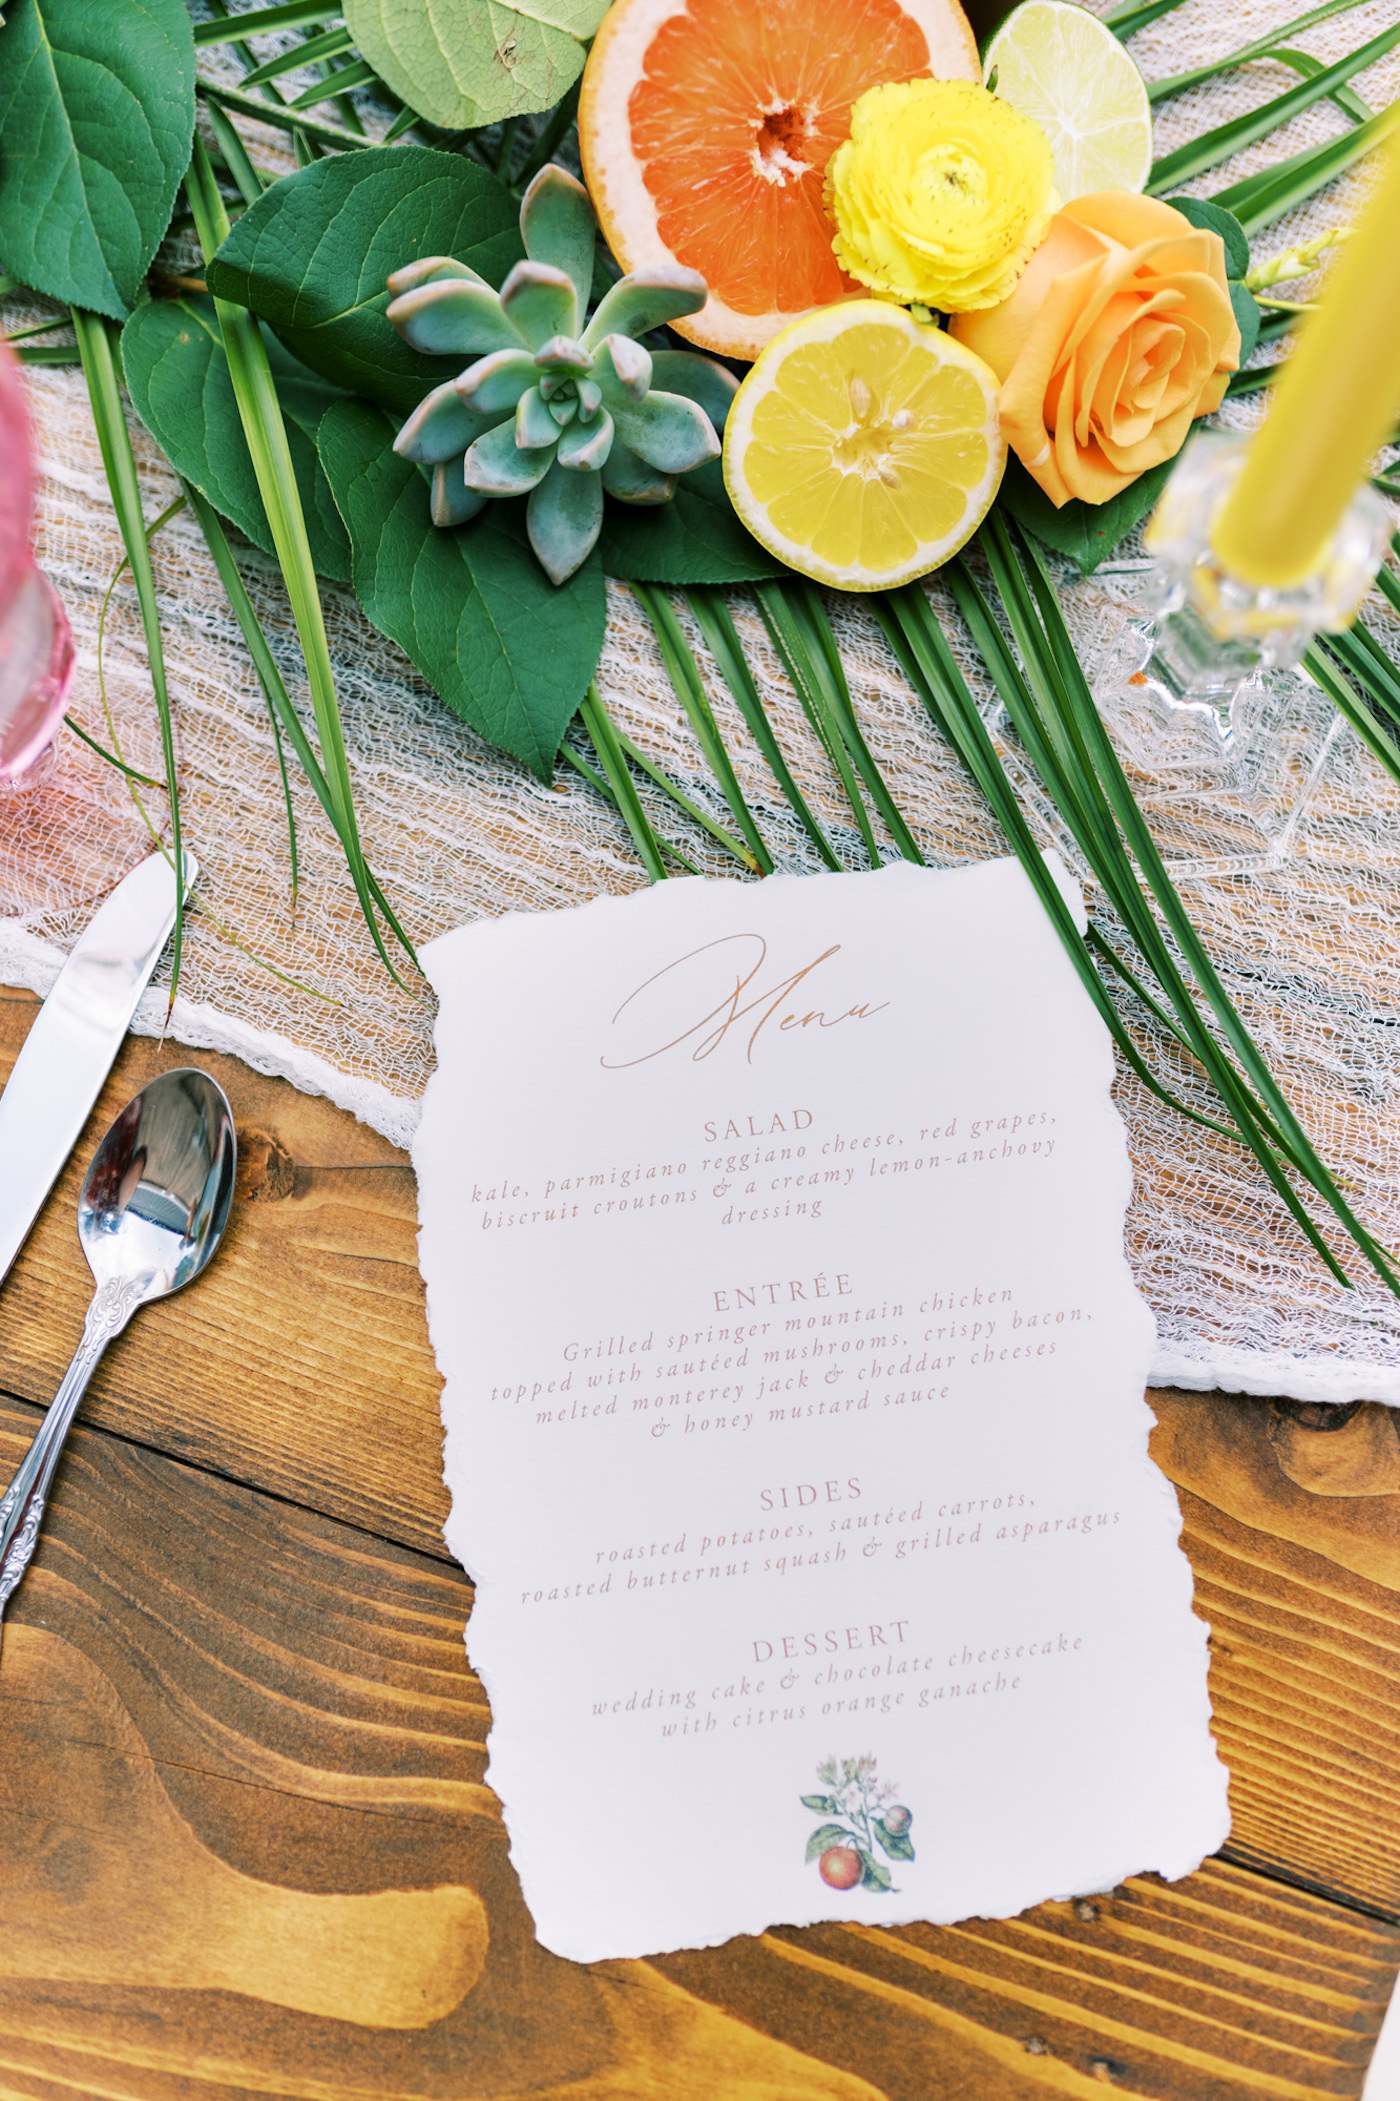 Bright Colorful Florida Citrus Wedding Inspiration | Raw Edge Wedding Menu Cards with Calligraphy and Orange Blossom Motif